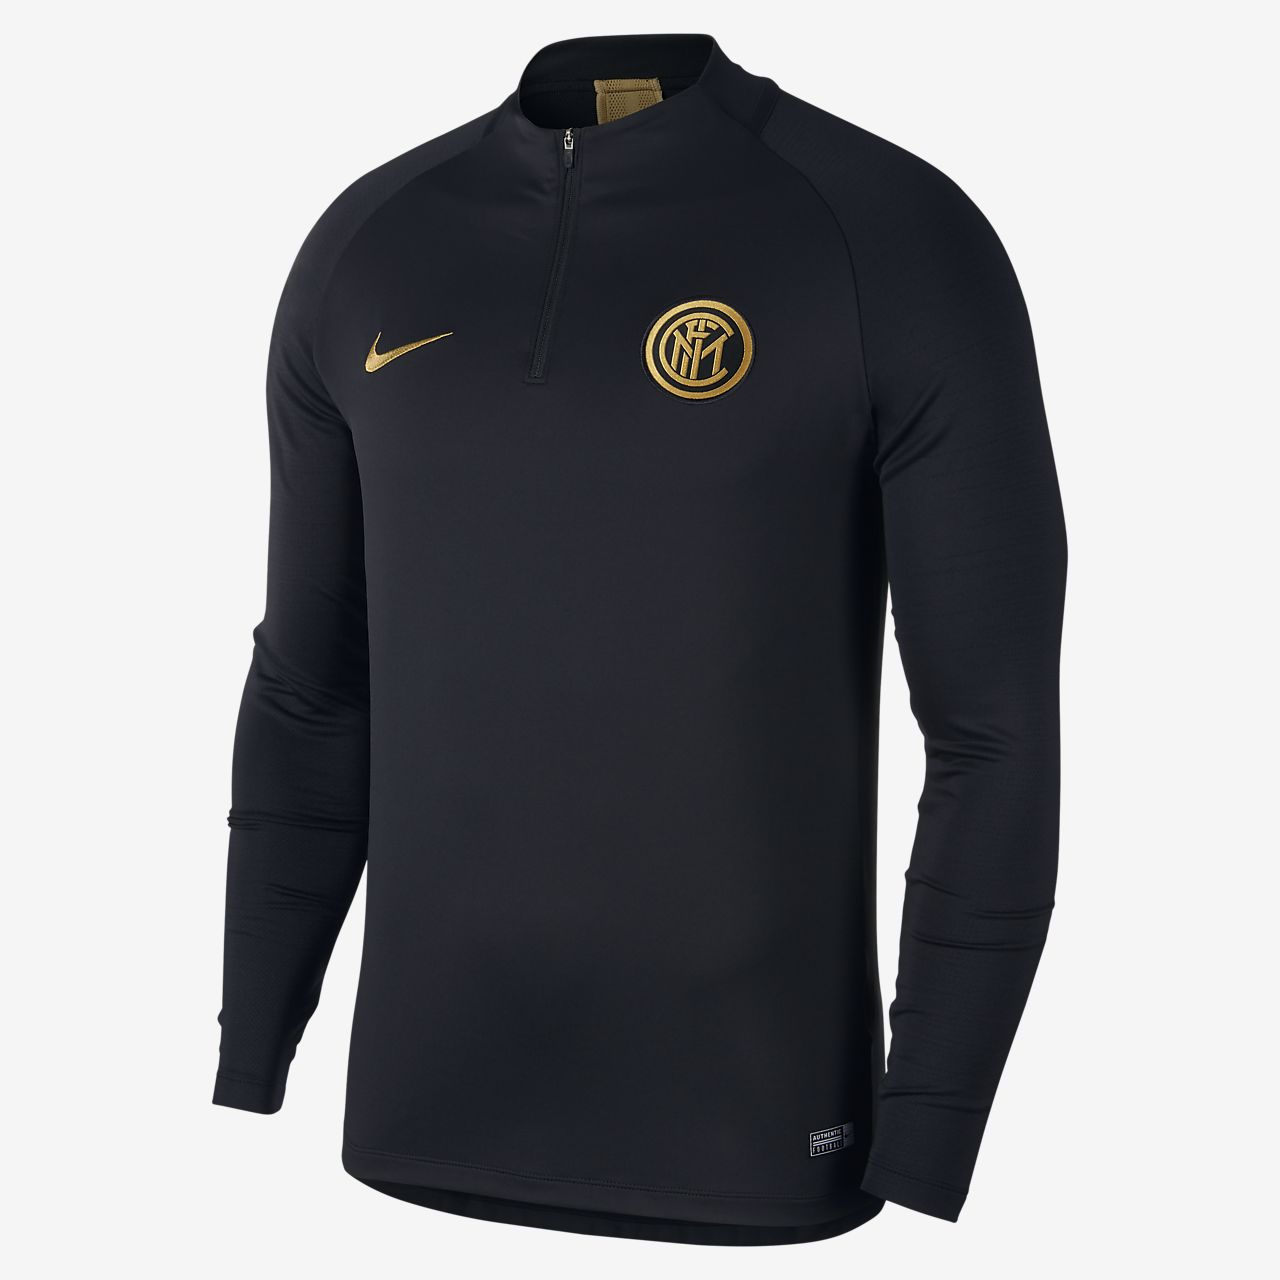 Nike Dri-FIT Inter Milan Strike férfi futball-gyakorlófelső